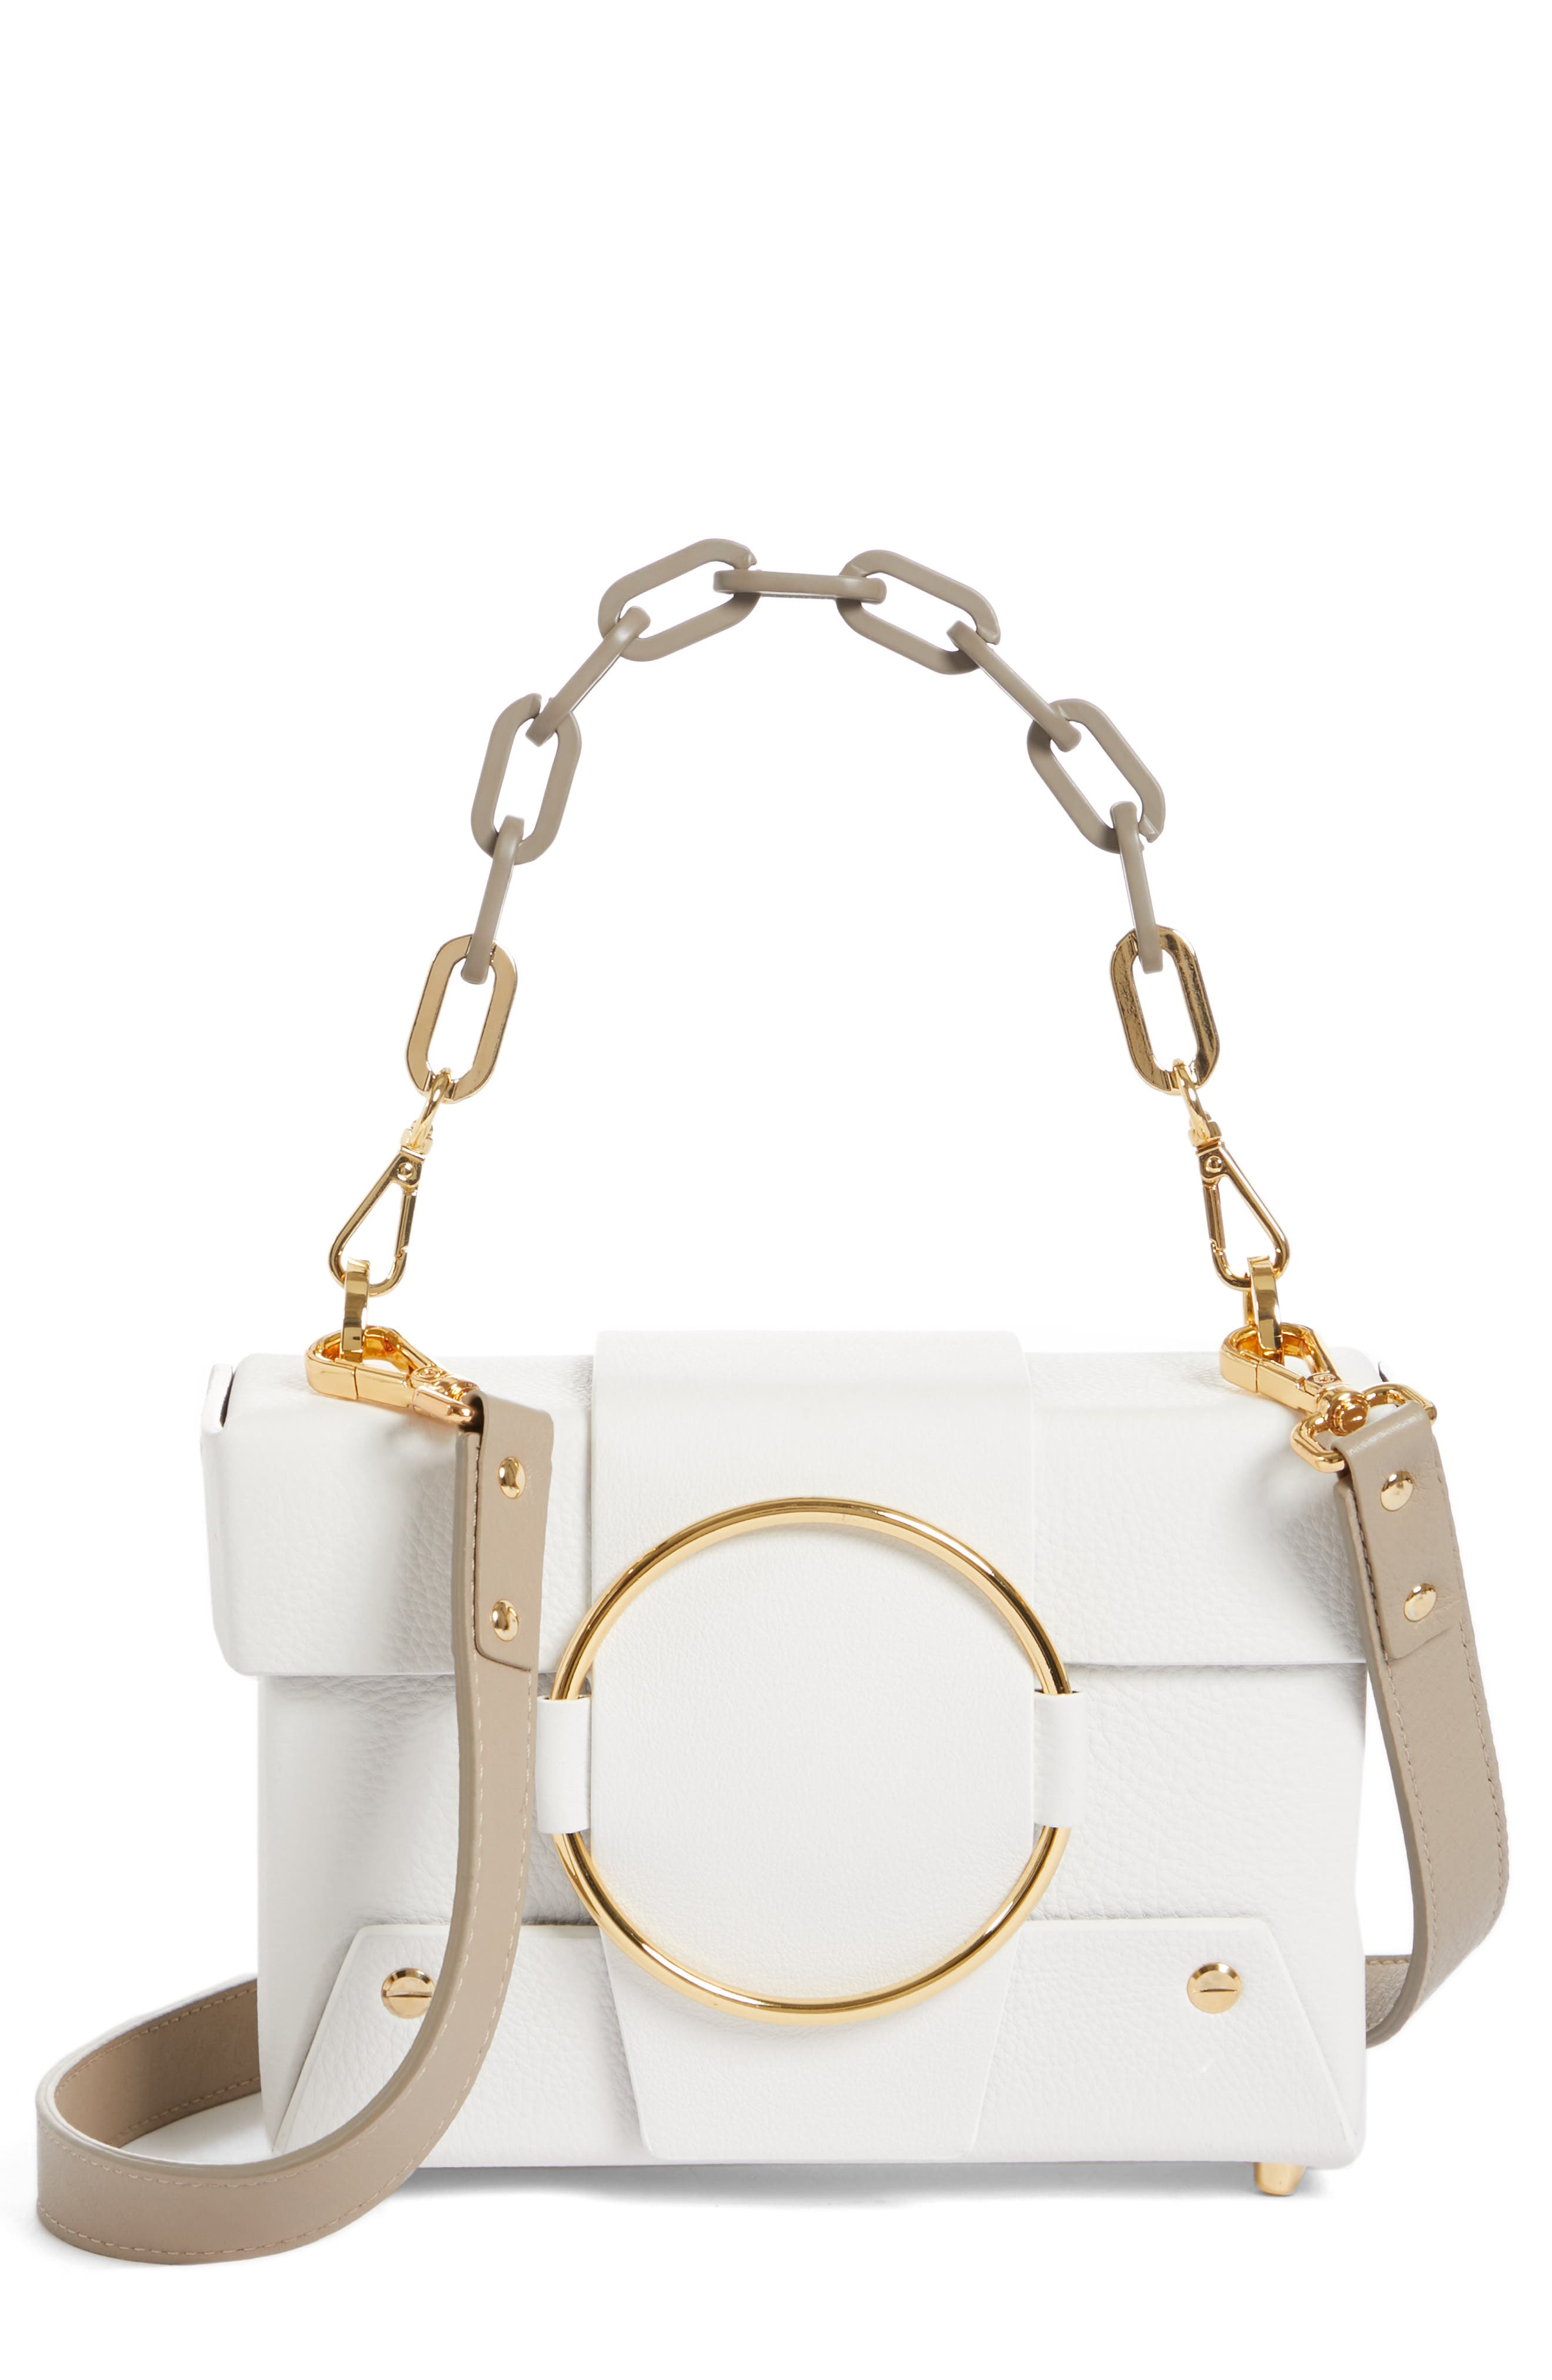 YUZEFI Asher Convertible Crossbody Bag - White in Bianco/ Kaky